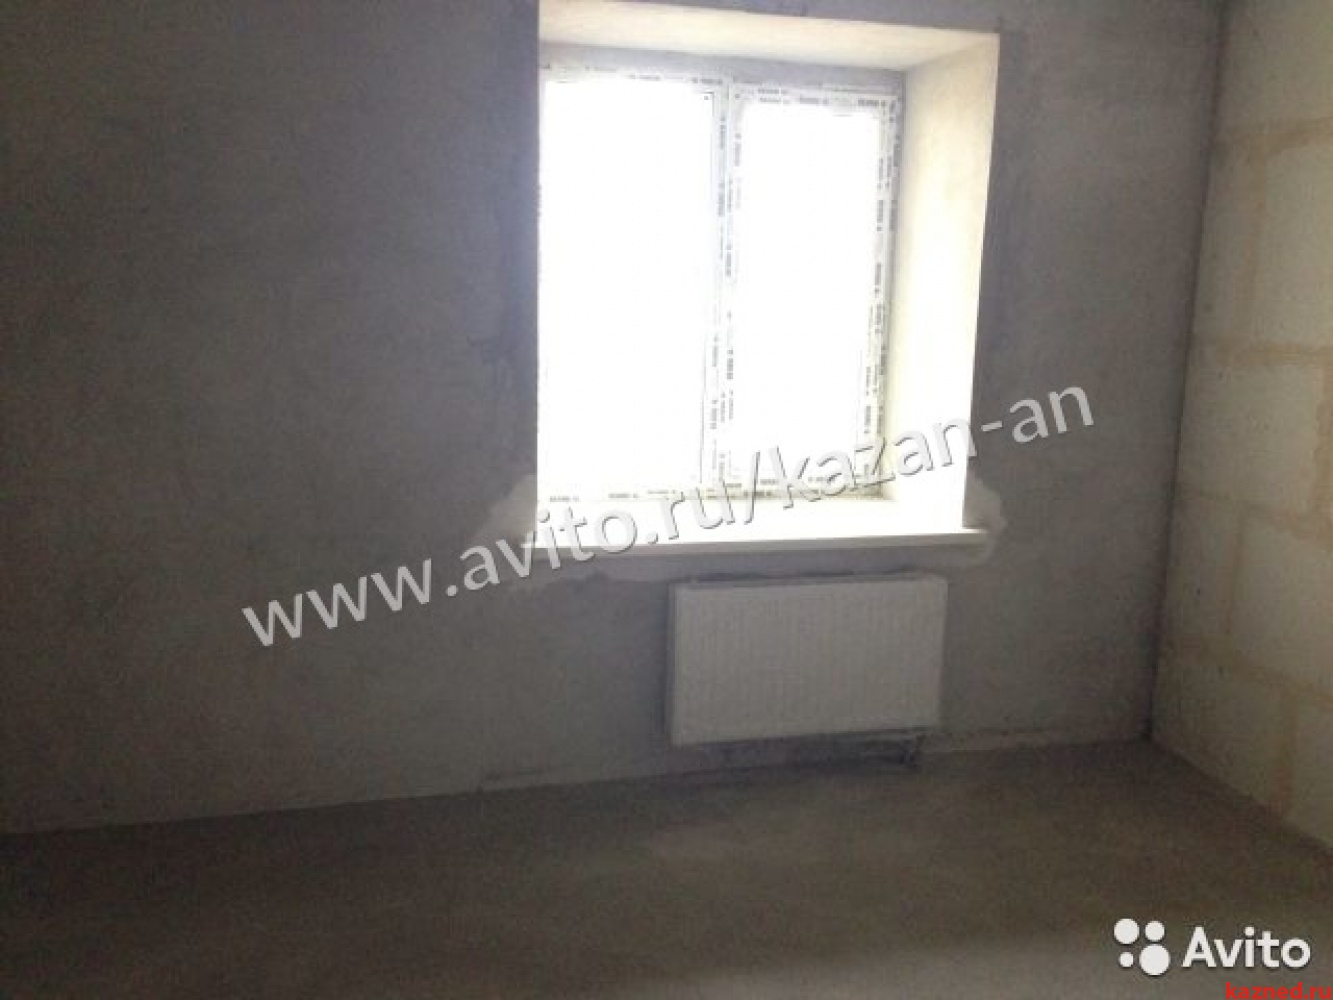 Продажа 1-к квартиры Лядова д15, 44 м² (миниатюра №8)